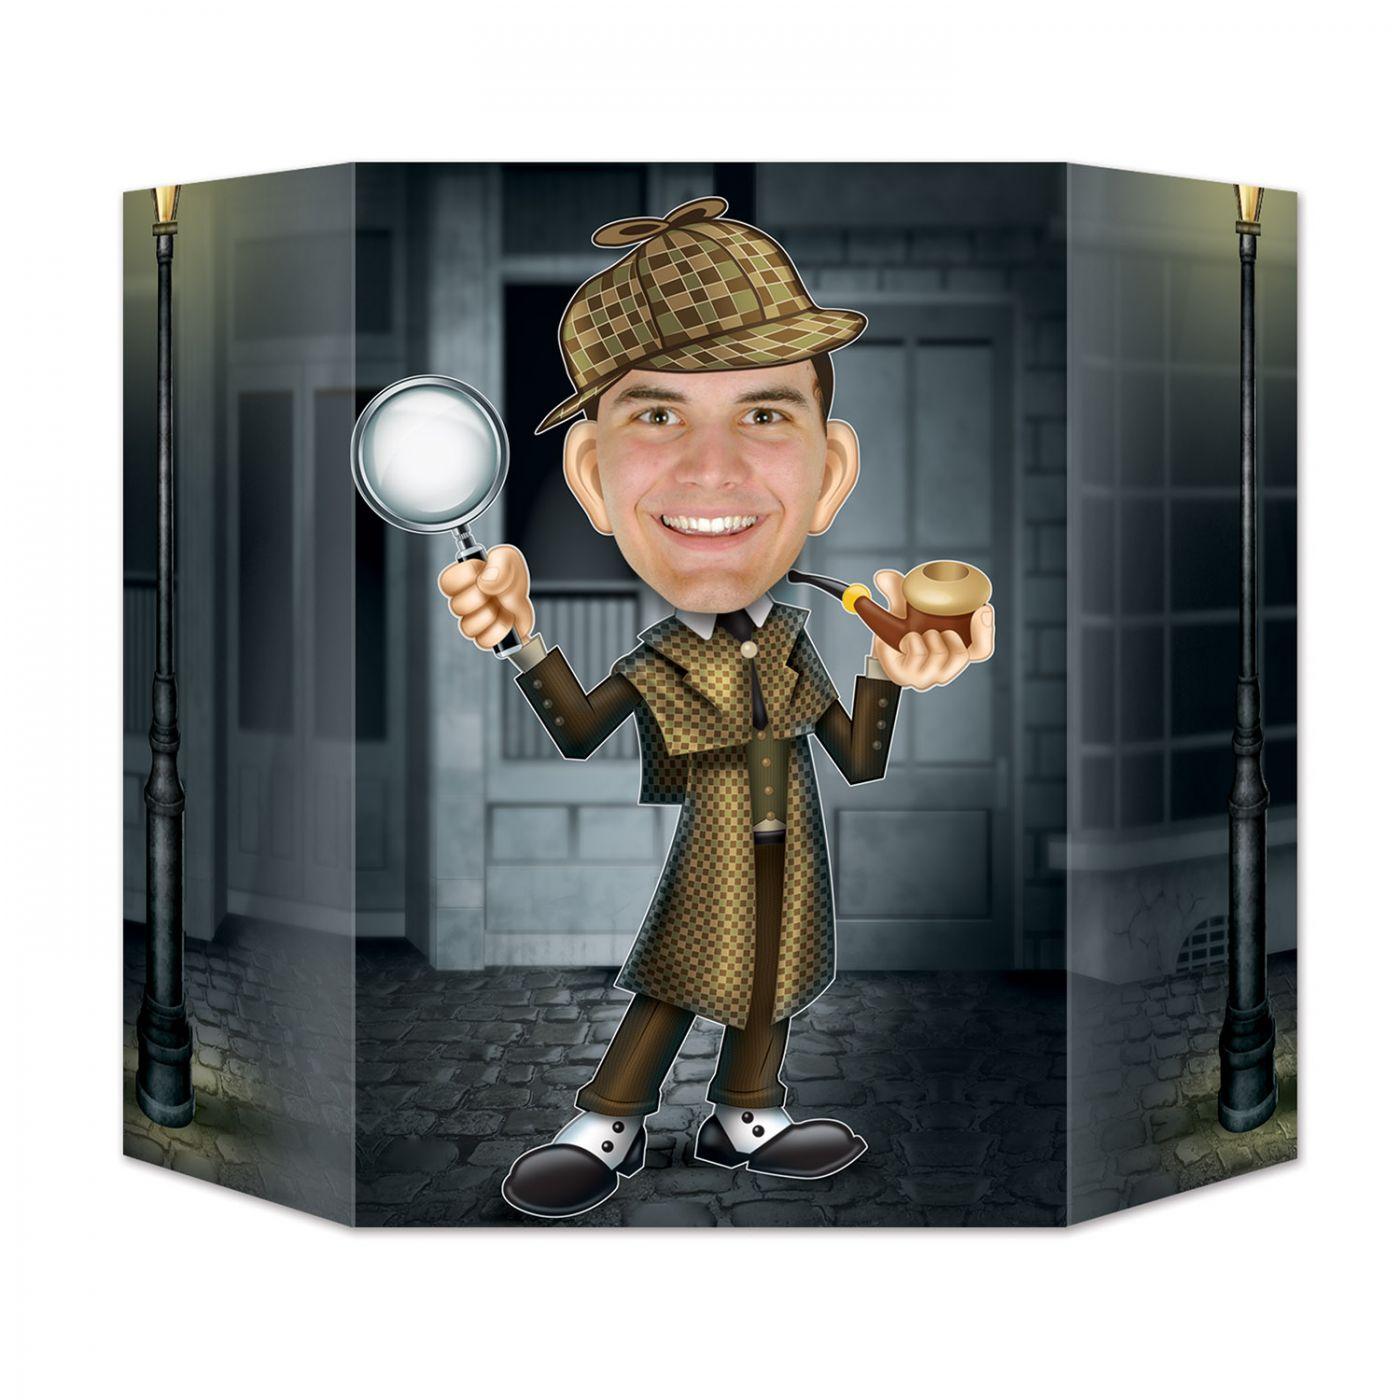 Sherlock Holmes Photo Prop (6) image